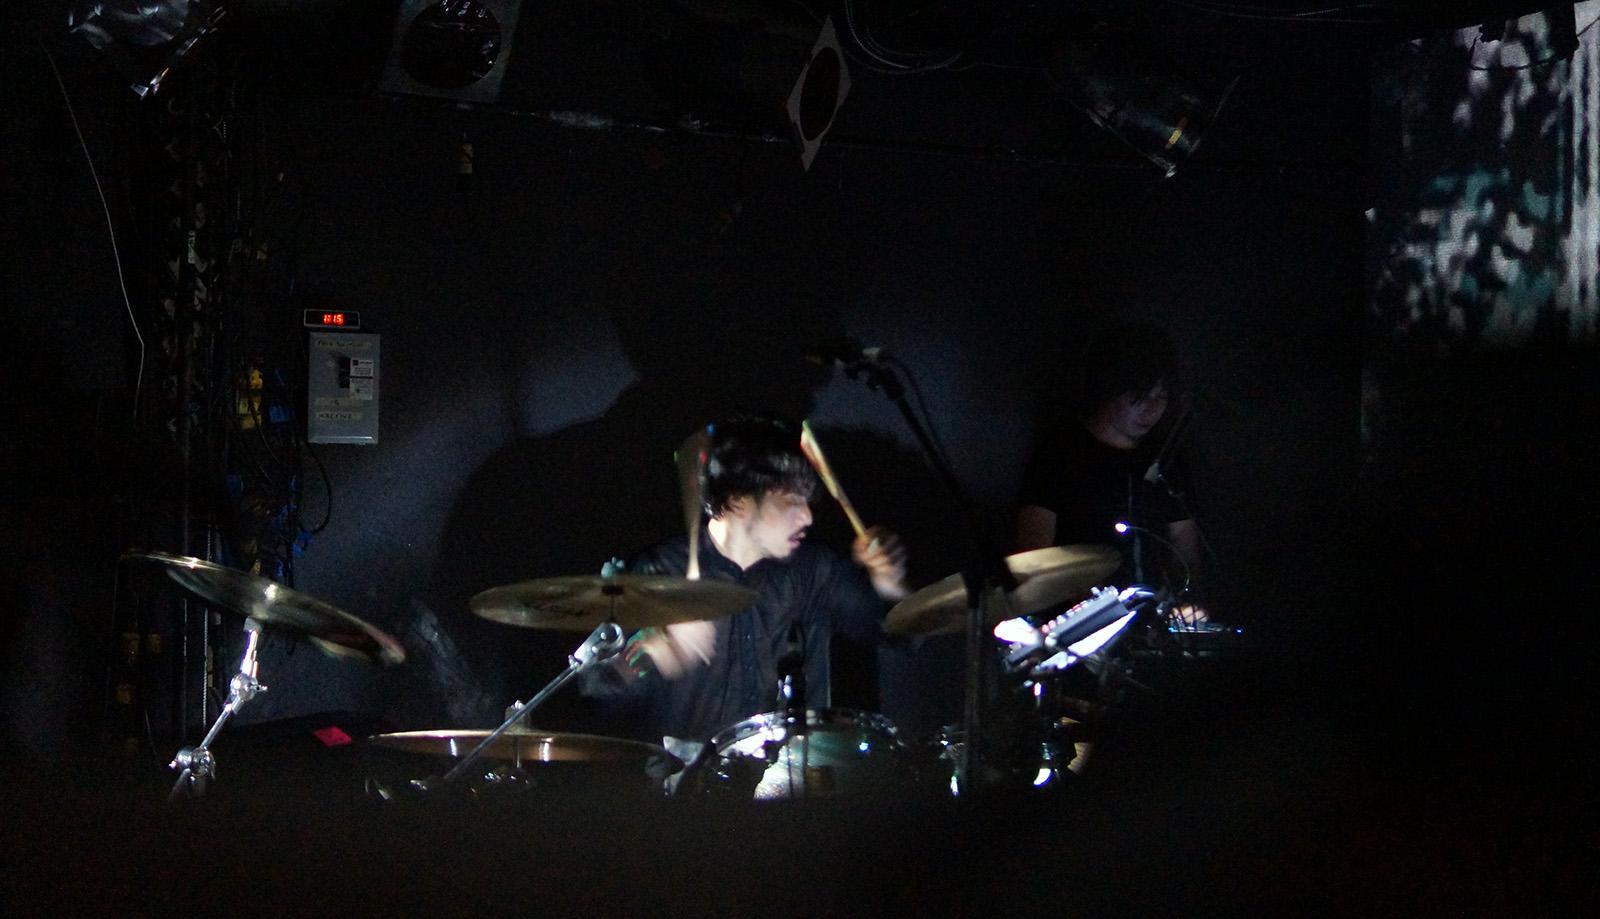 kawasaki drum